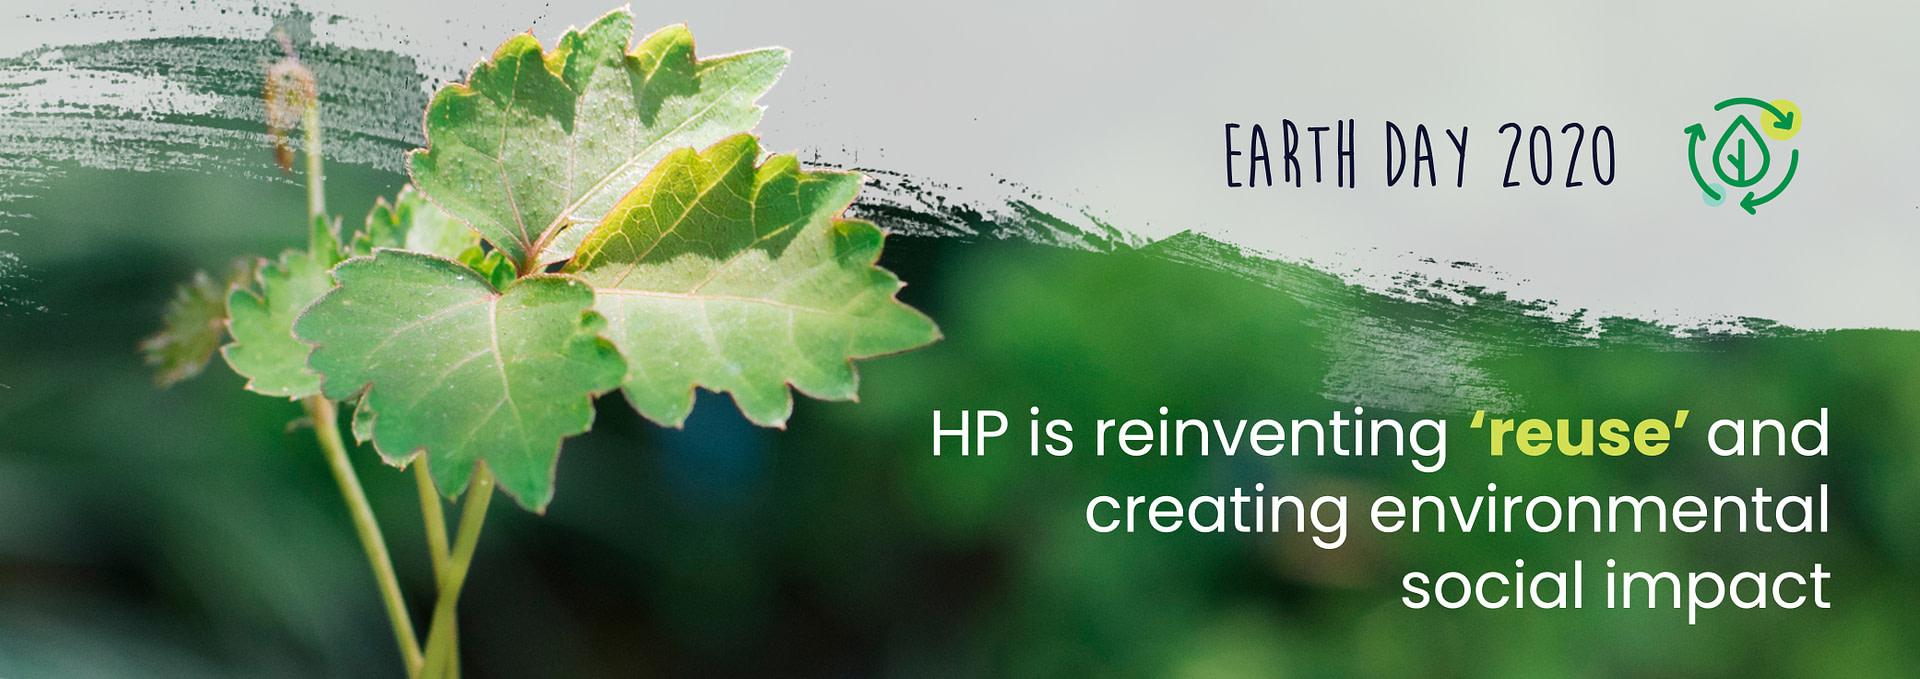 HP Technology on Environmental Sustainability